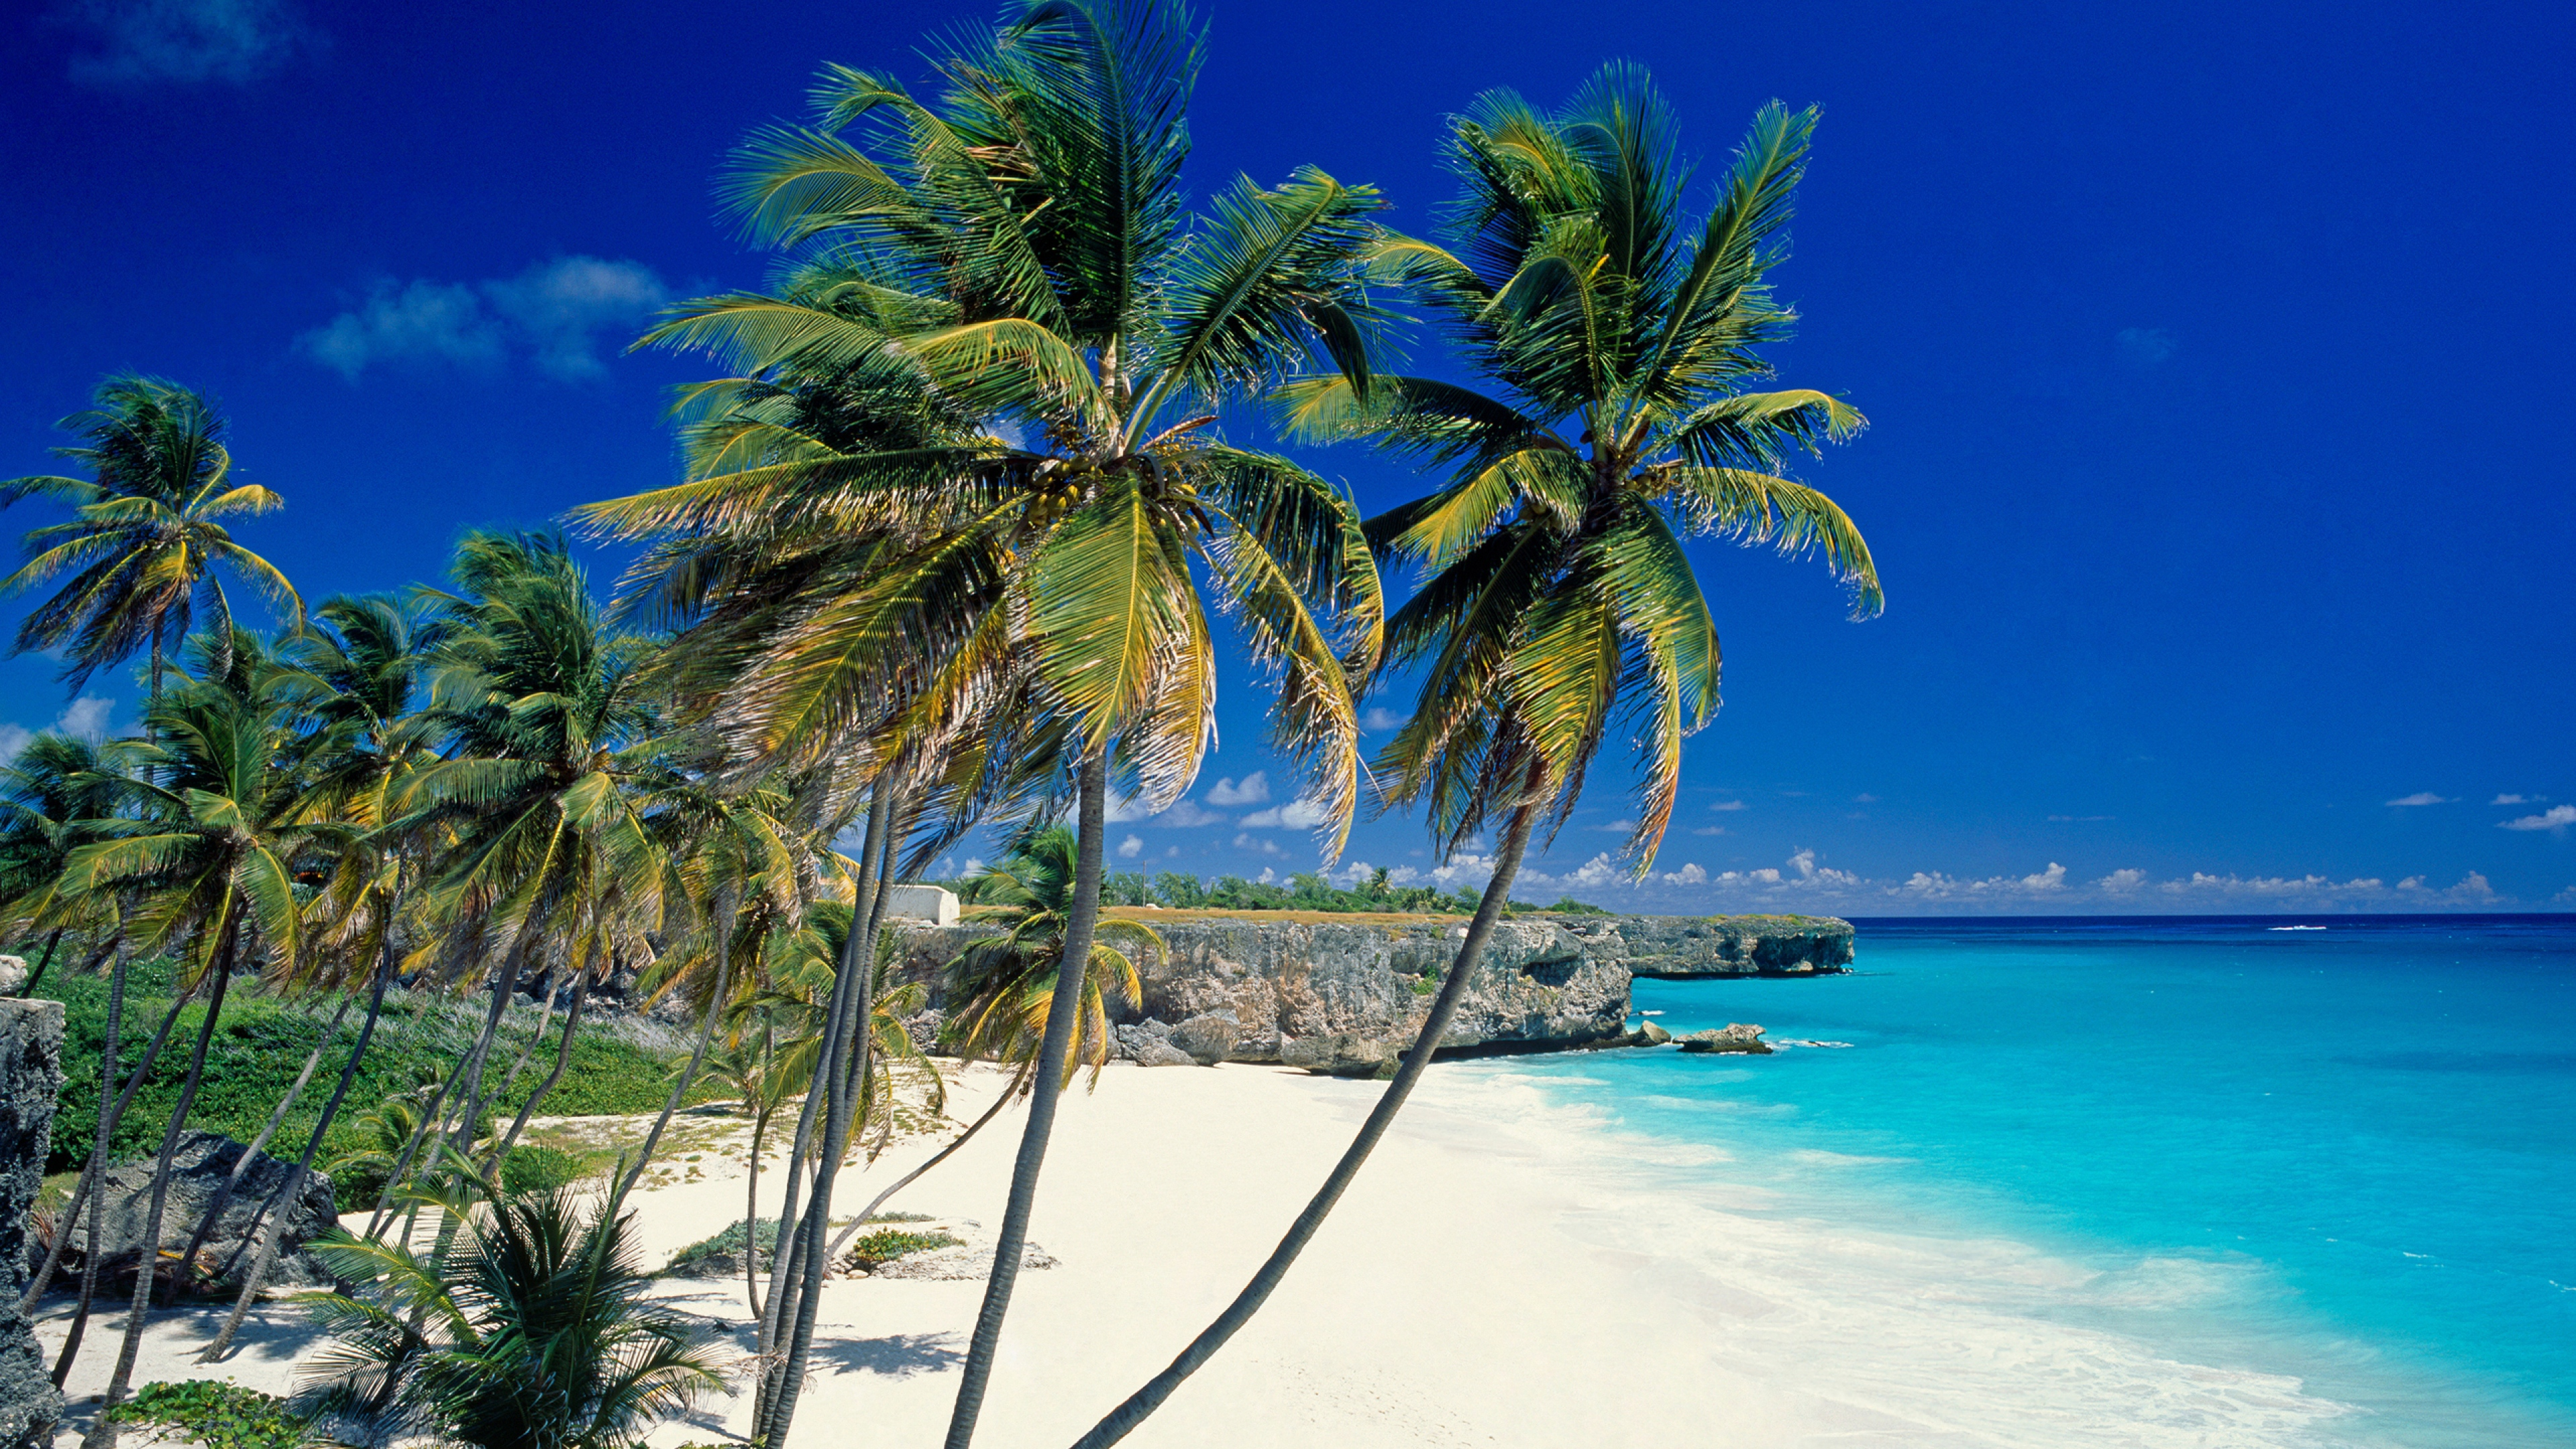 Wallpaper 3840x2160 beach tropics sea sand palm trees beautiful 3840x2160